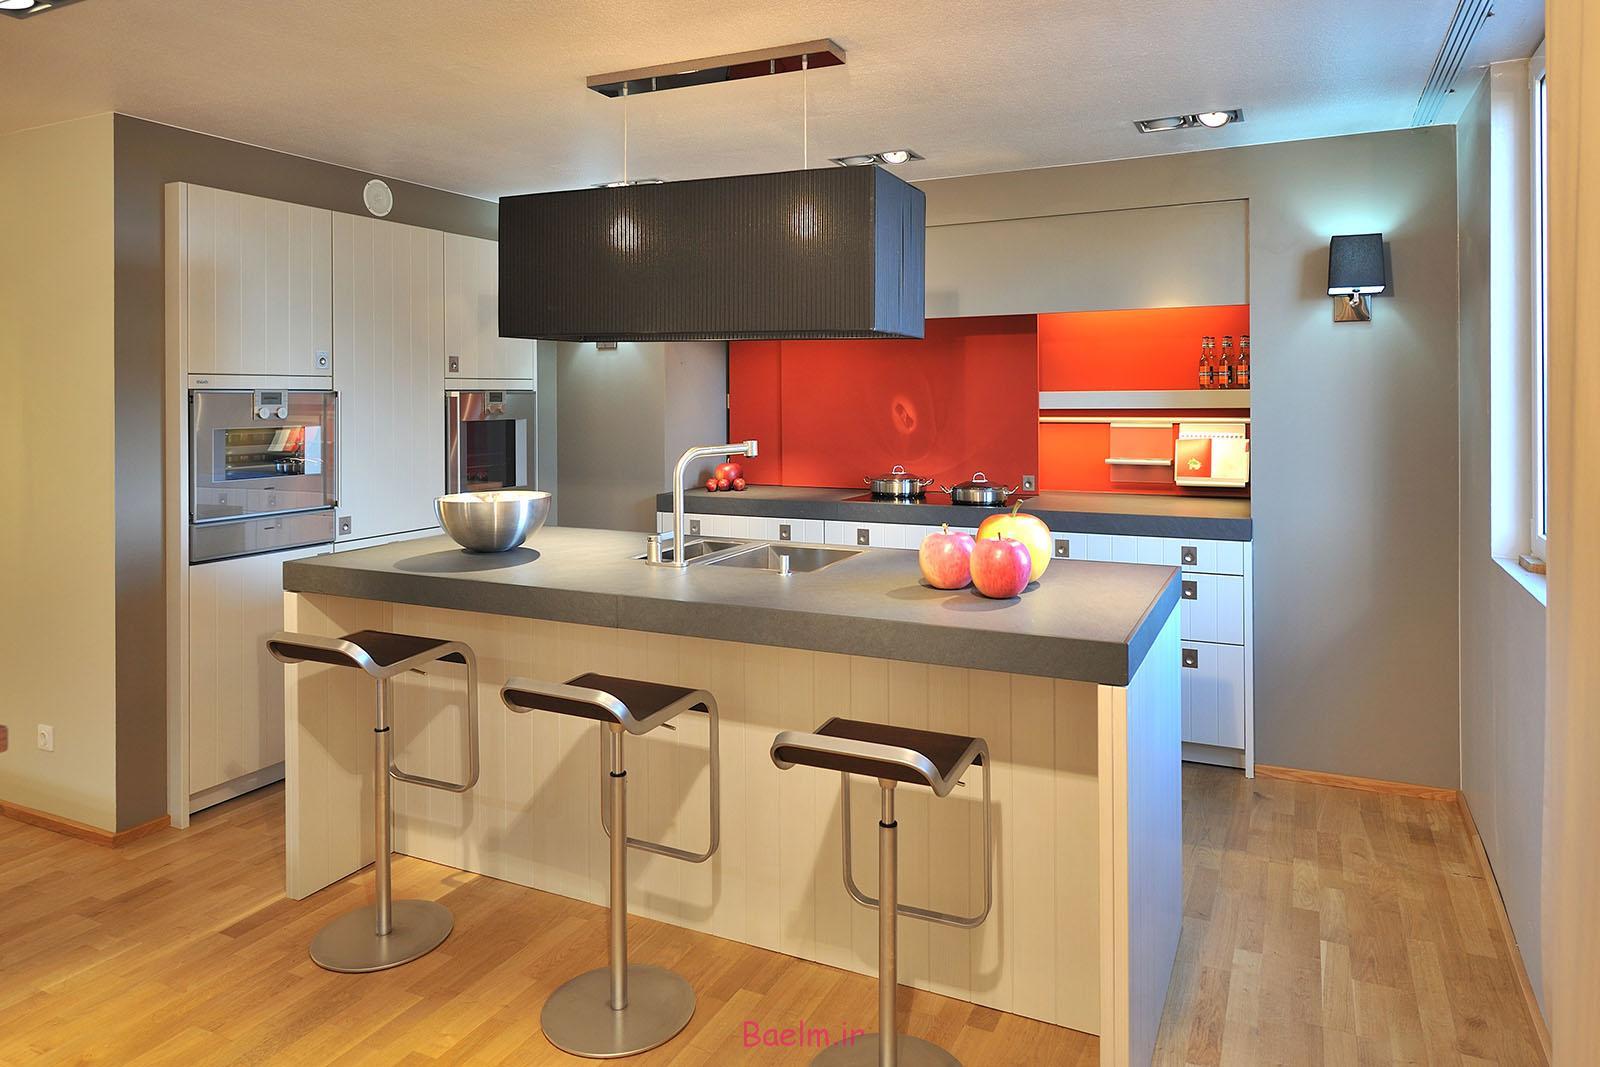 kitchen design ideas 6 Kitchen Design Ideas